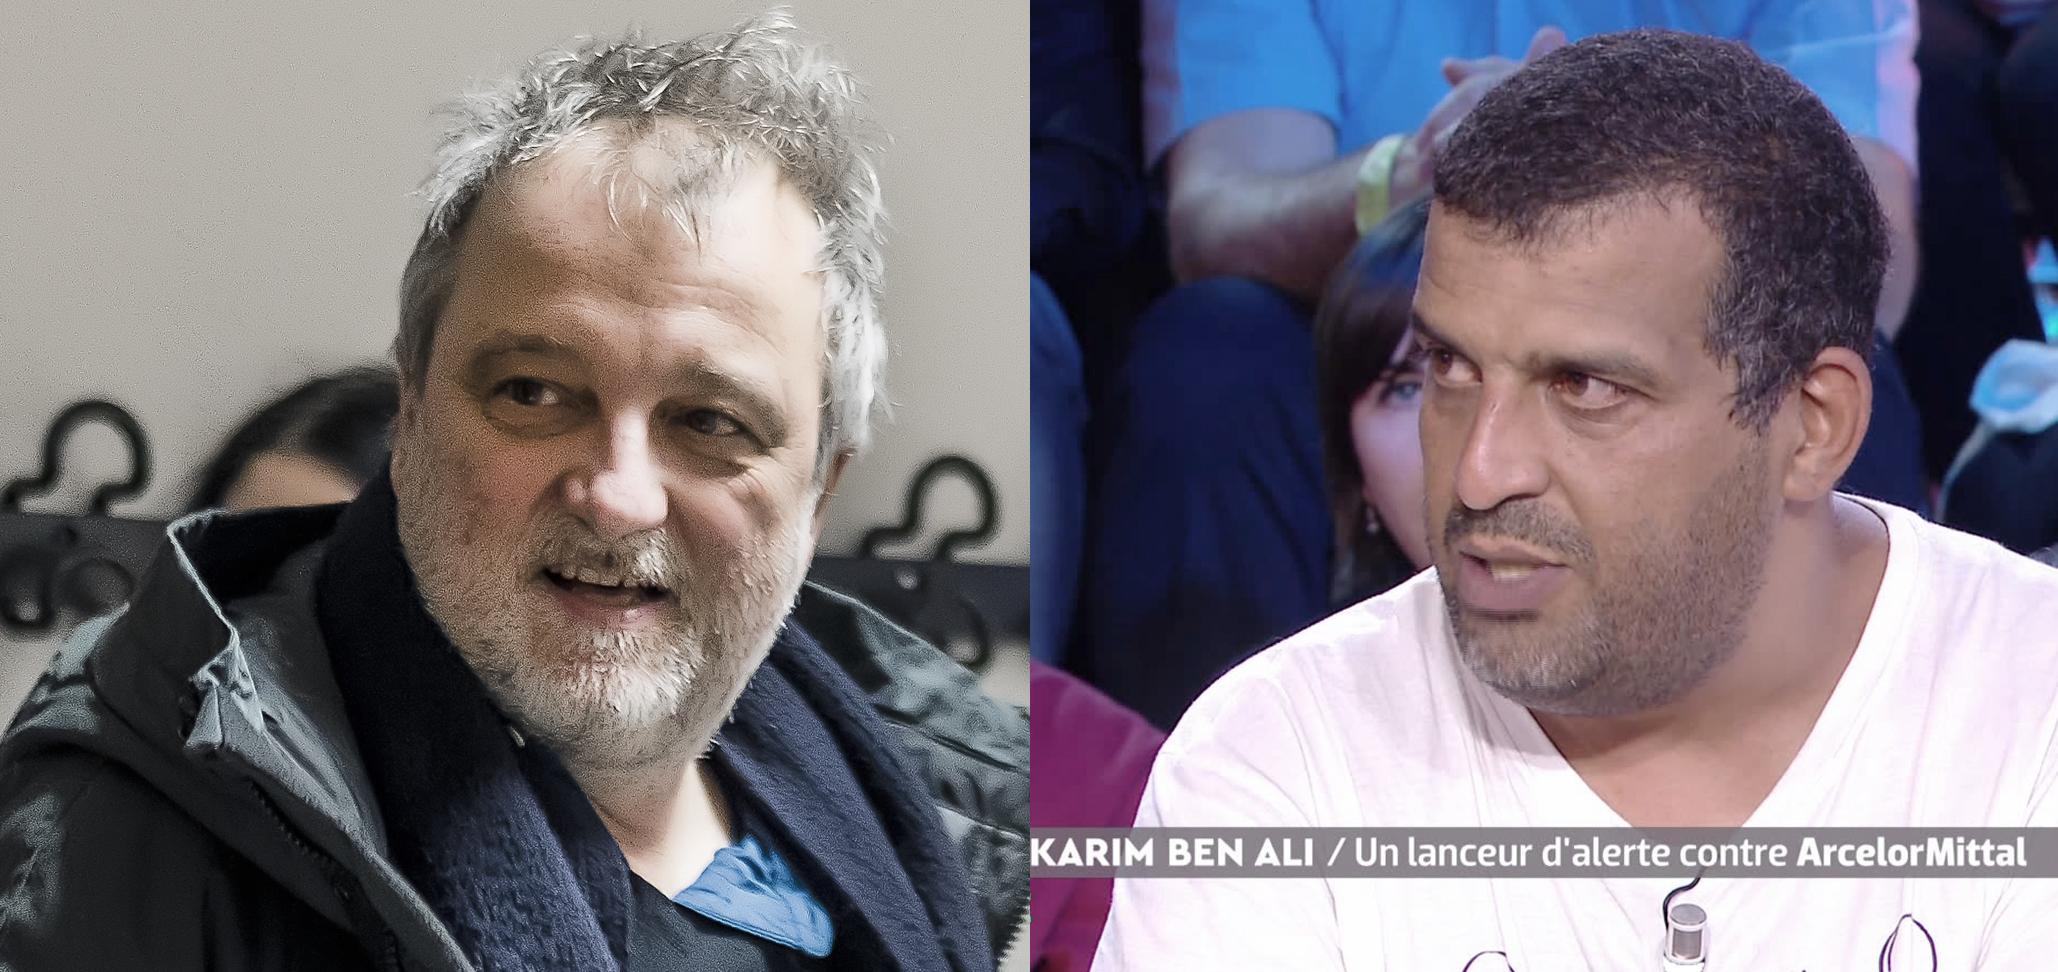 Rencontre avec Denis Robert et Karim Ben Ali à Metz